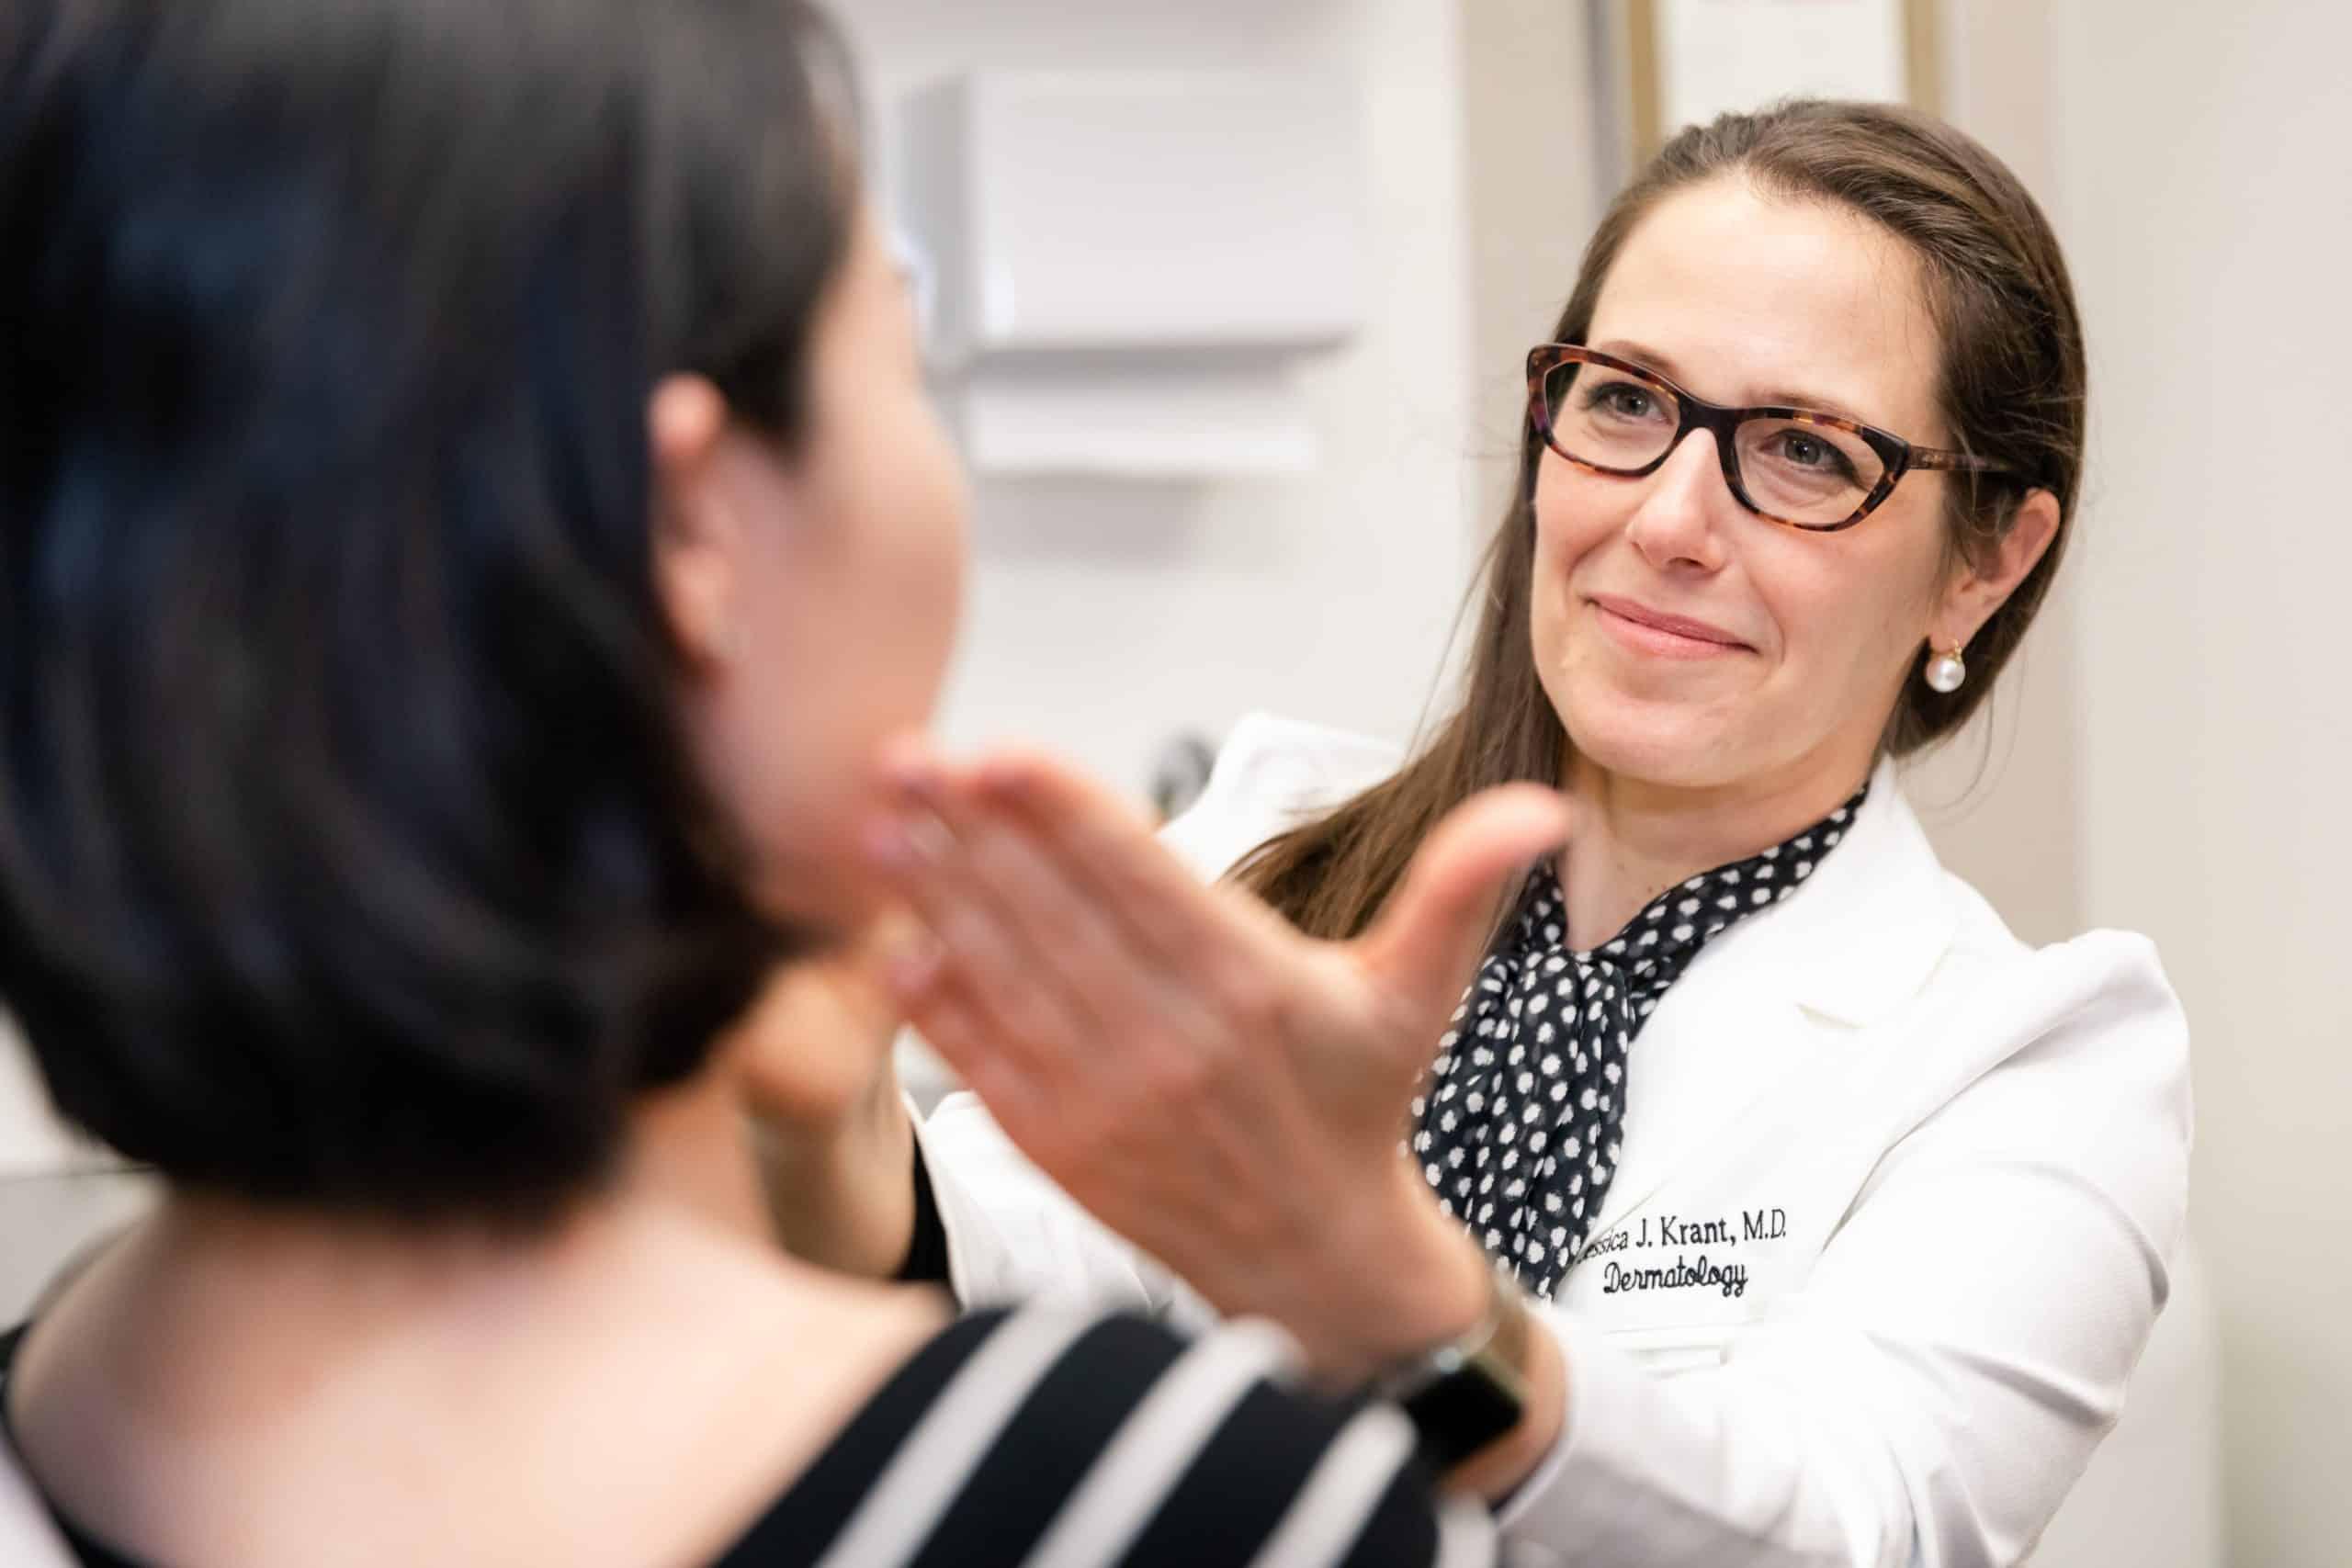 acne doctor in new york